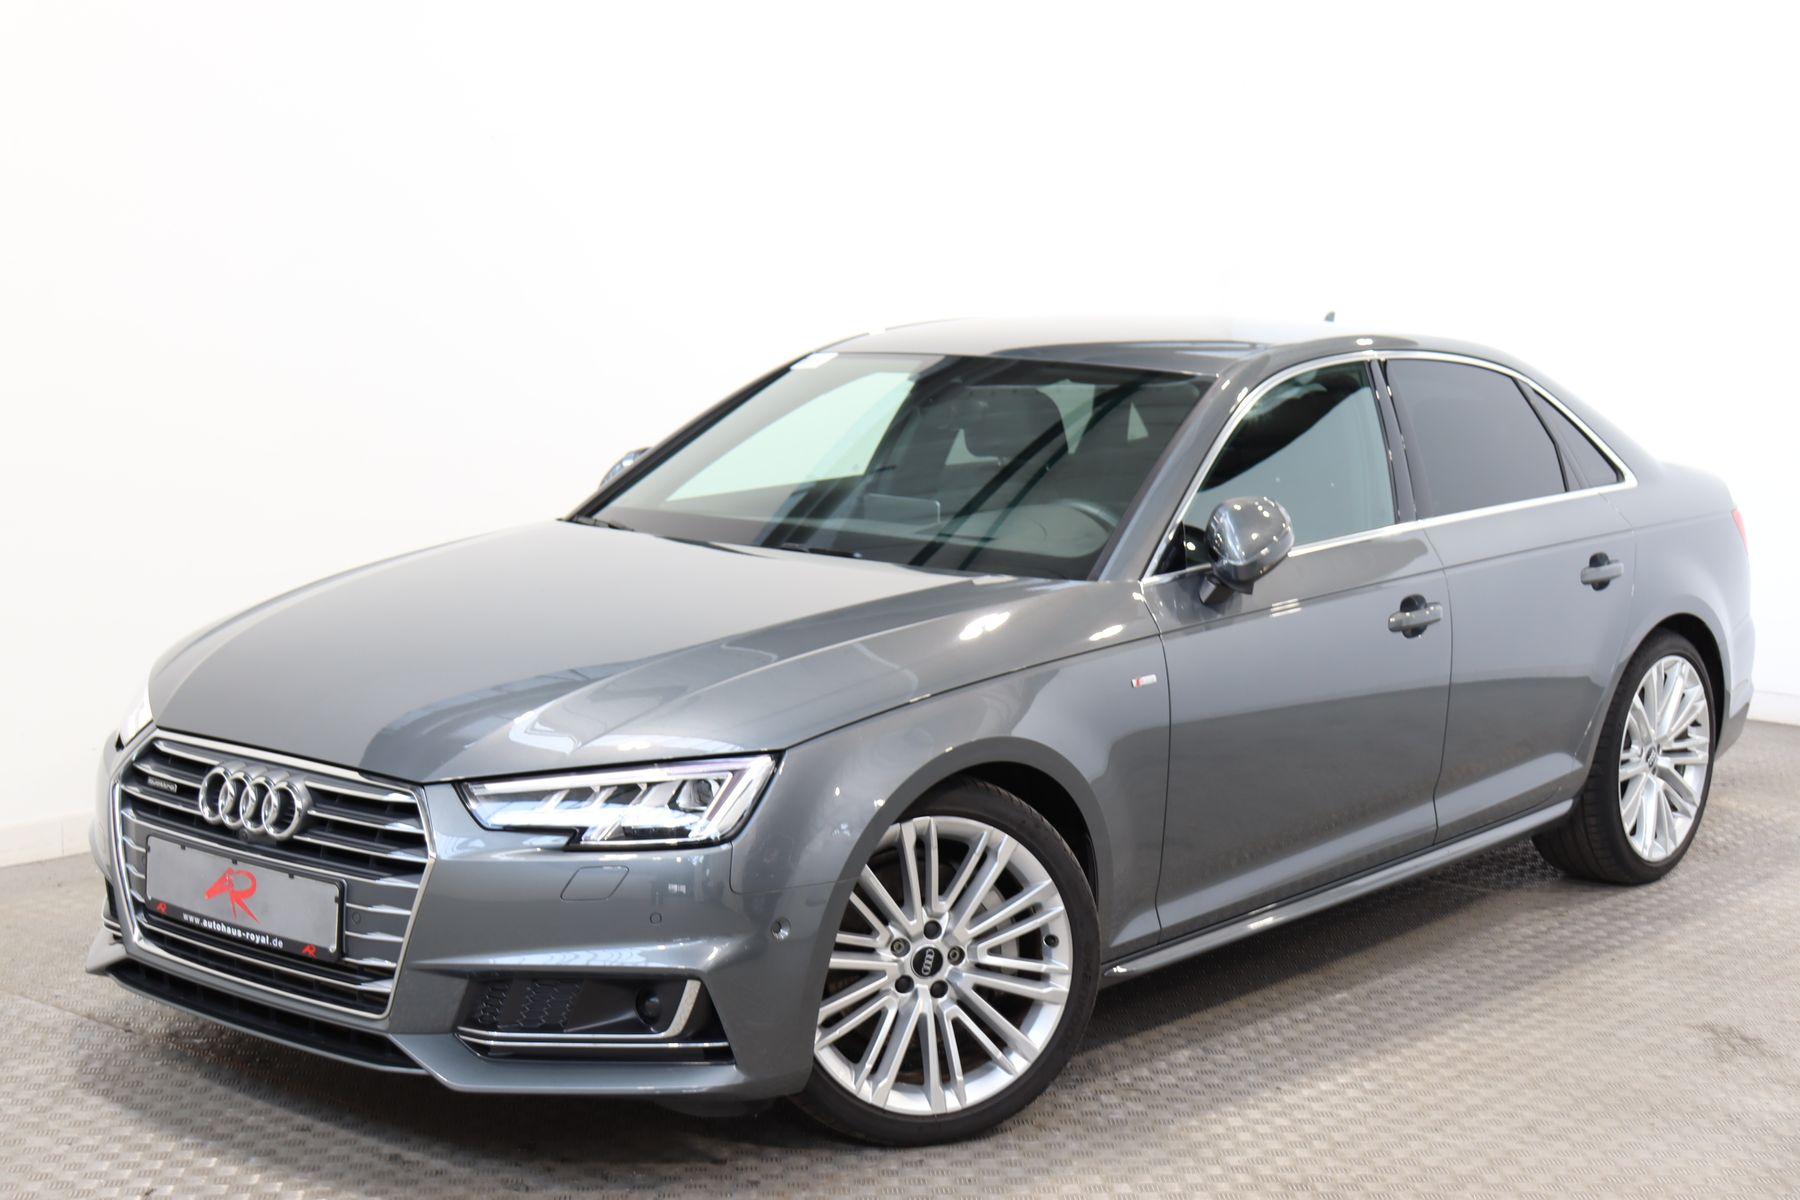 Audi A4 3.0 TDI qu 3x S LINE VIRTUAL,BANG+O,HUD,ACC, Jahr 2016, Diesel